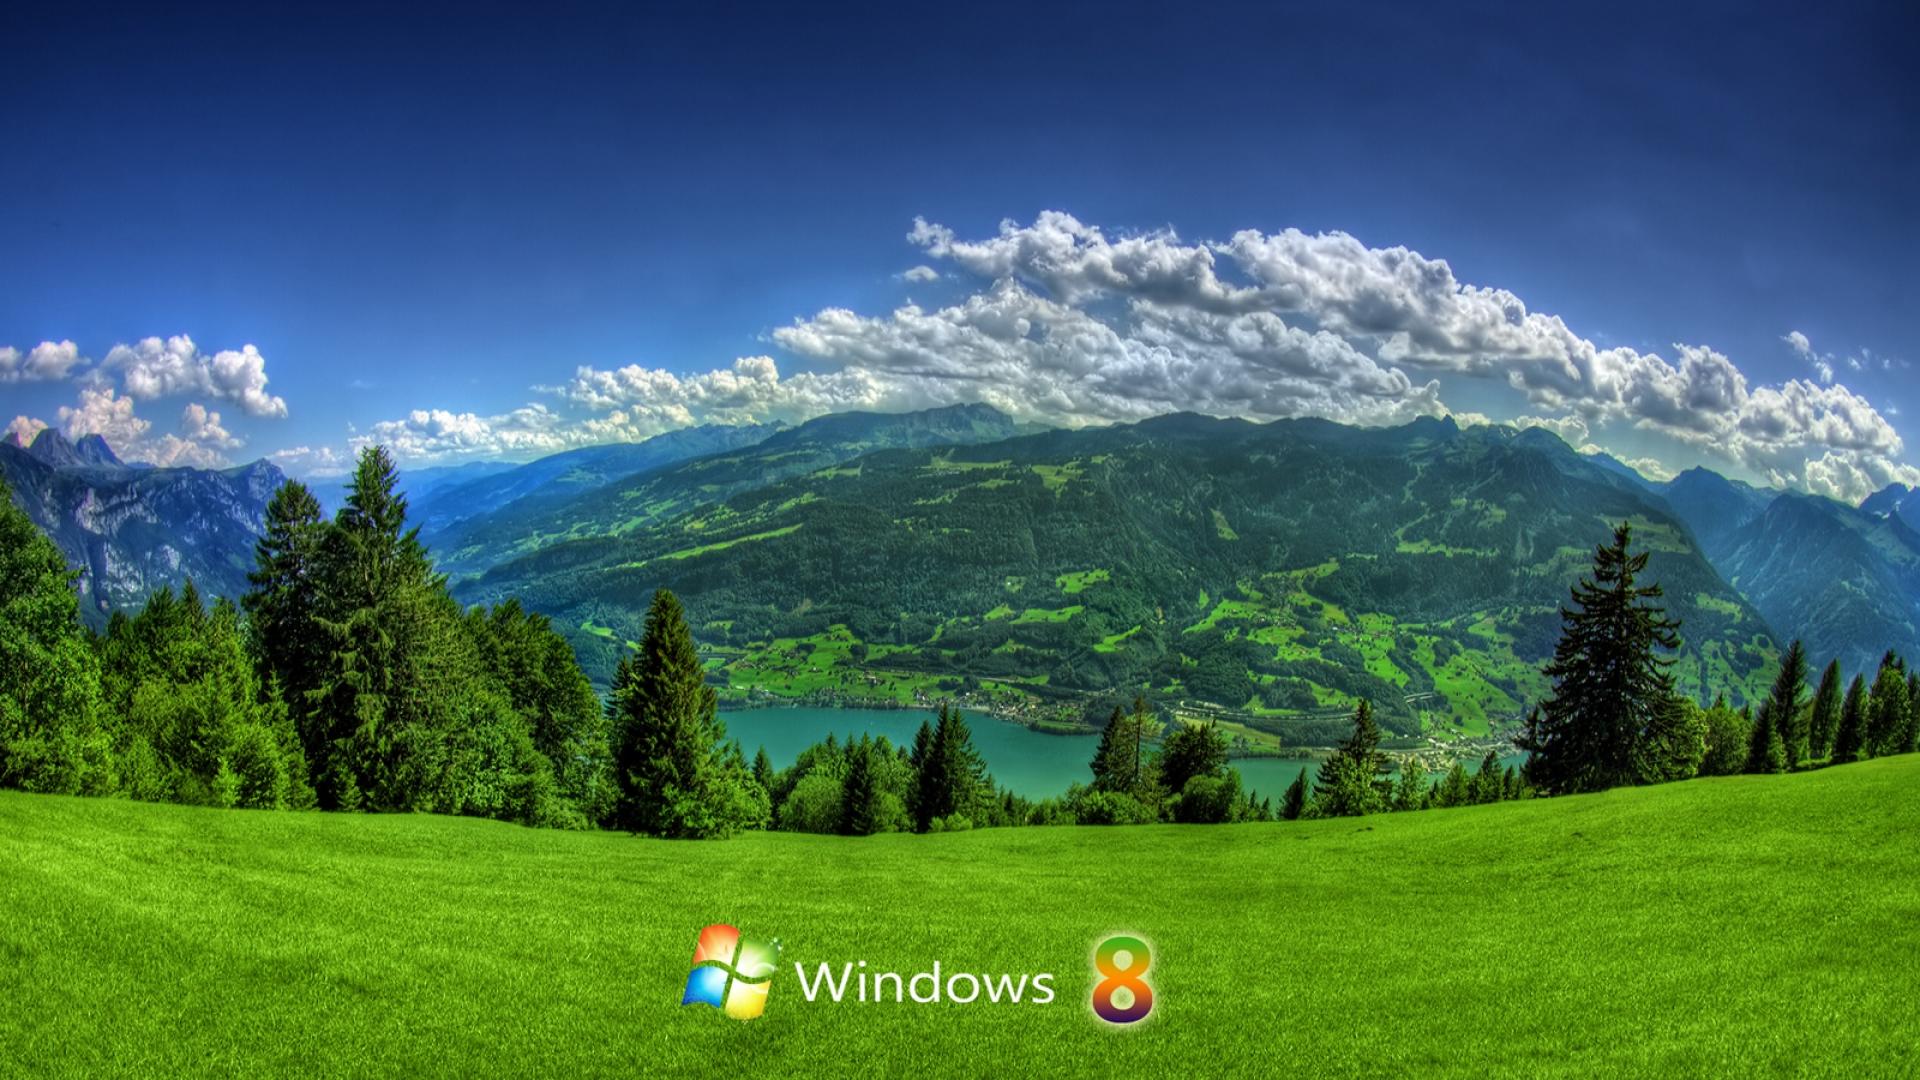 Download Landscape Windows 8 HD Wallpaper 2023 Full Size 1920x1080